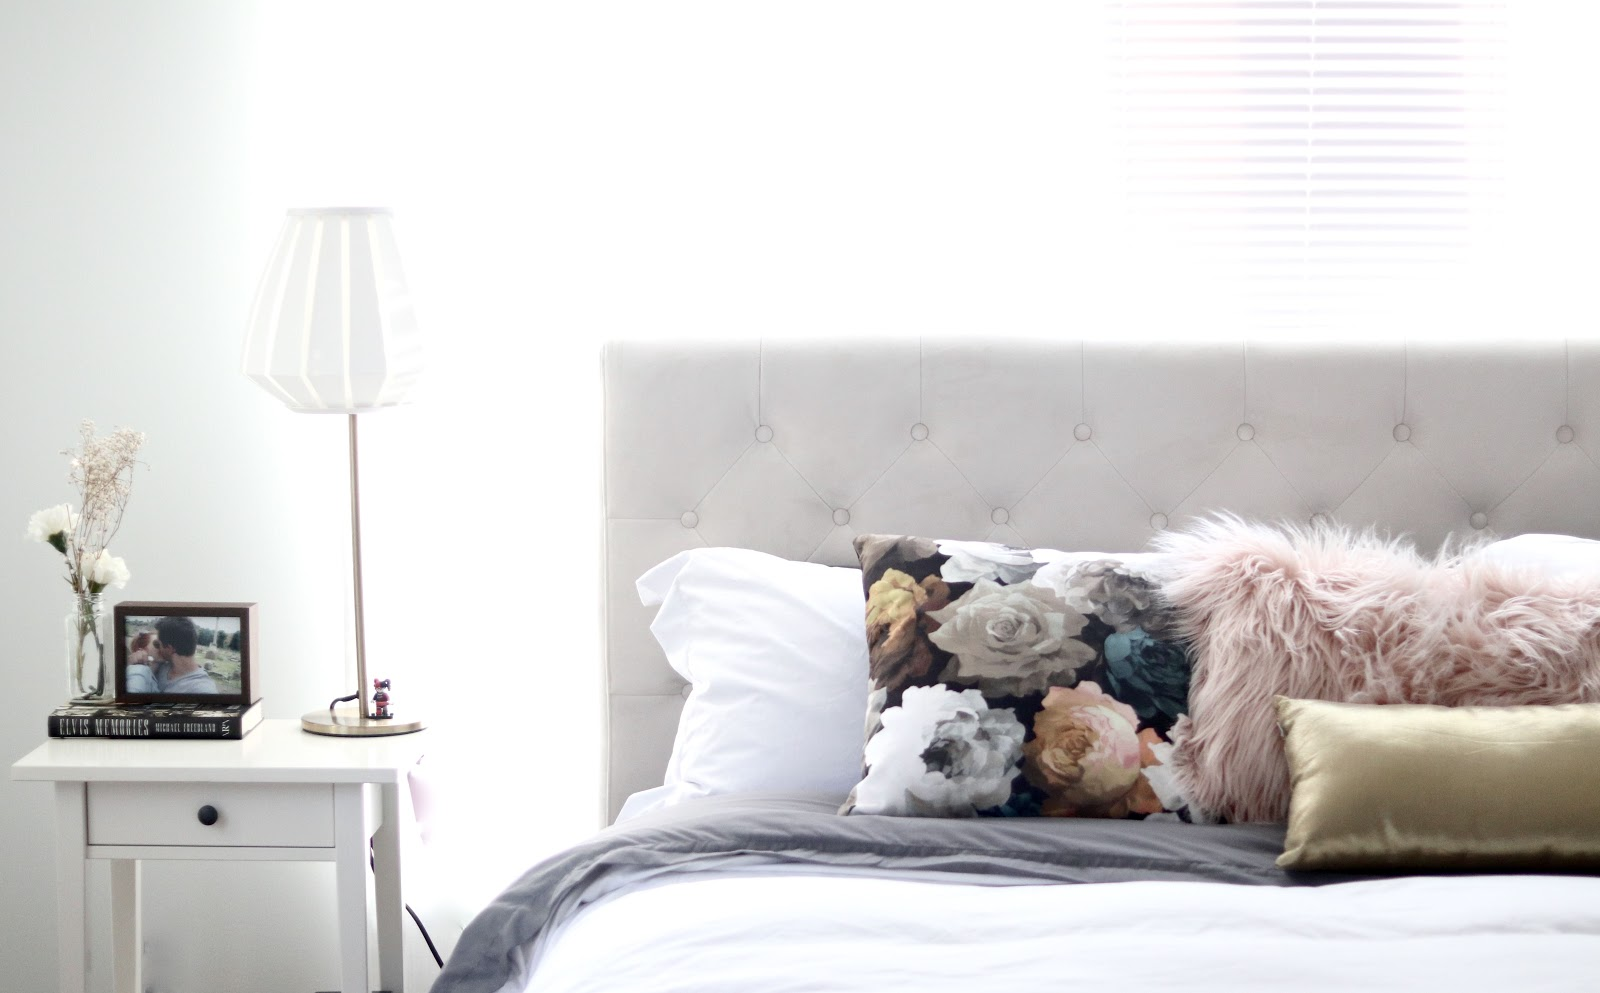 White bedroom with Benji sleep Toronto based company